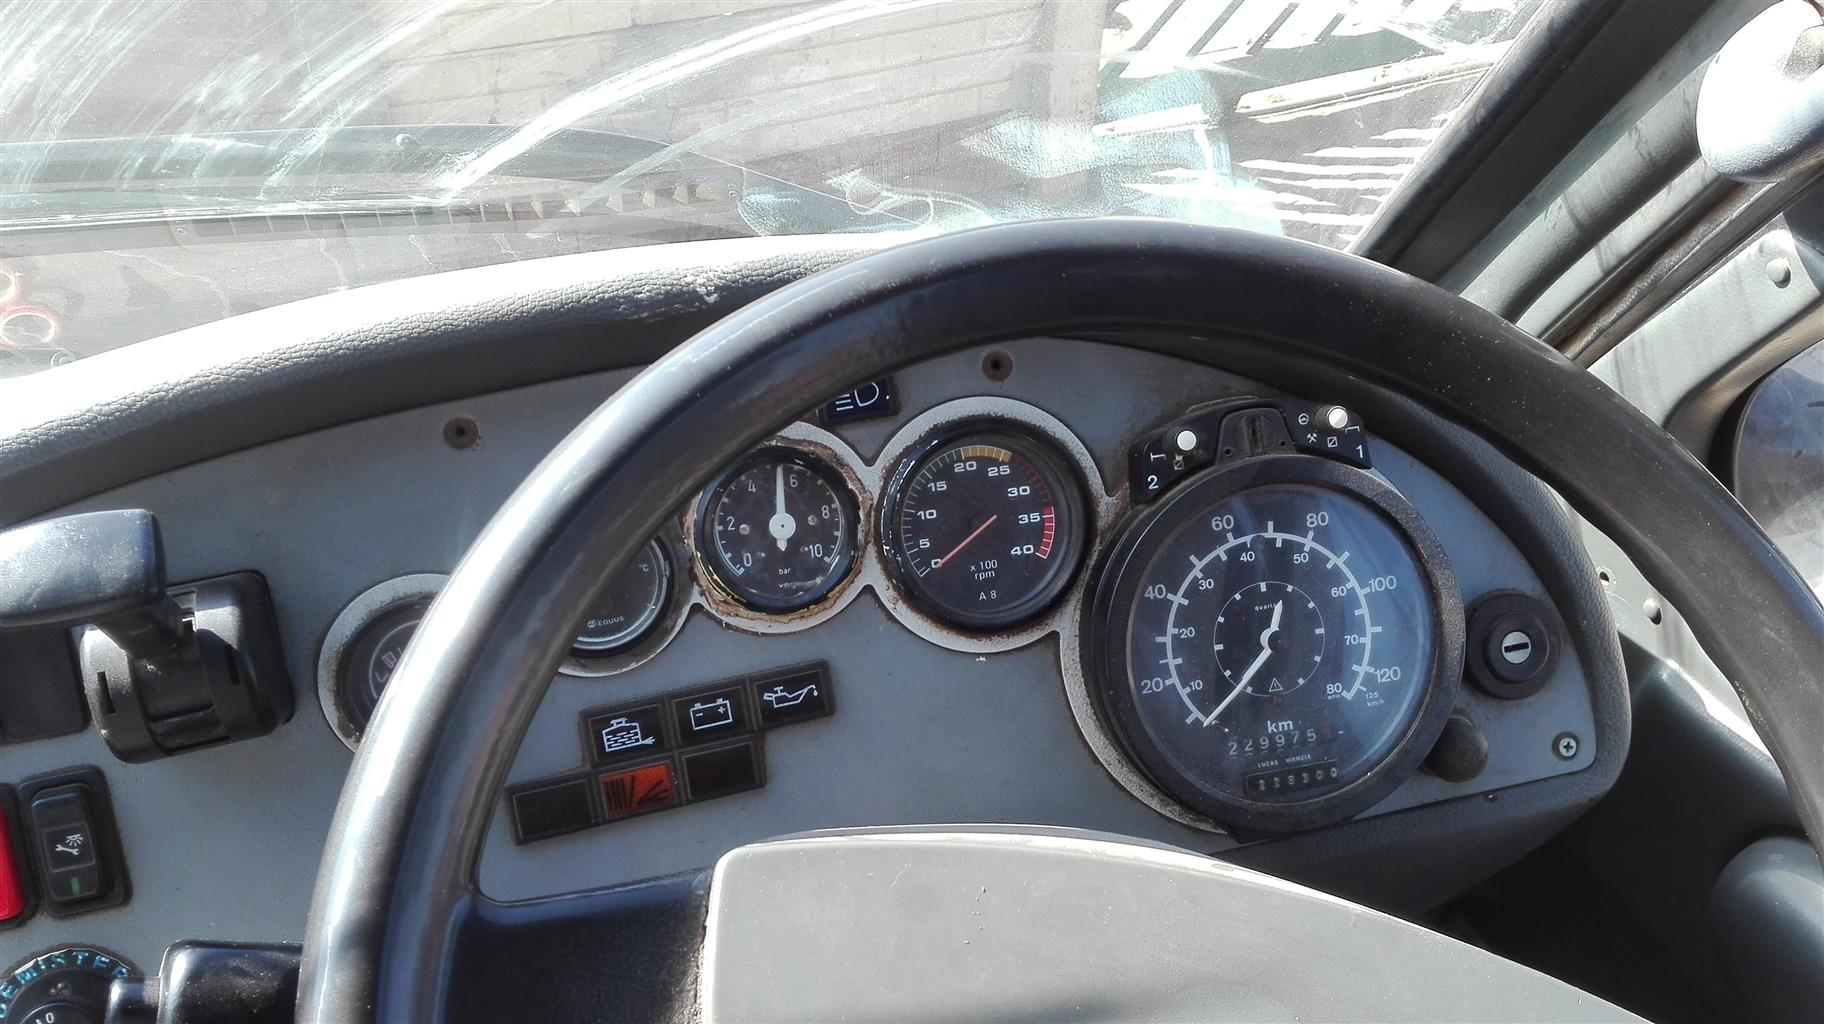 2007 MG ZT 190